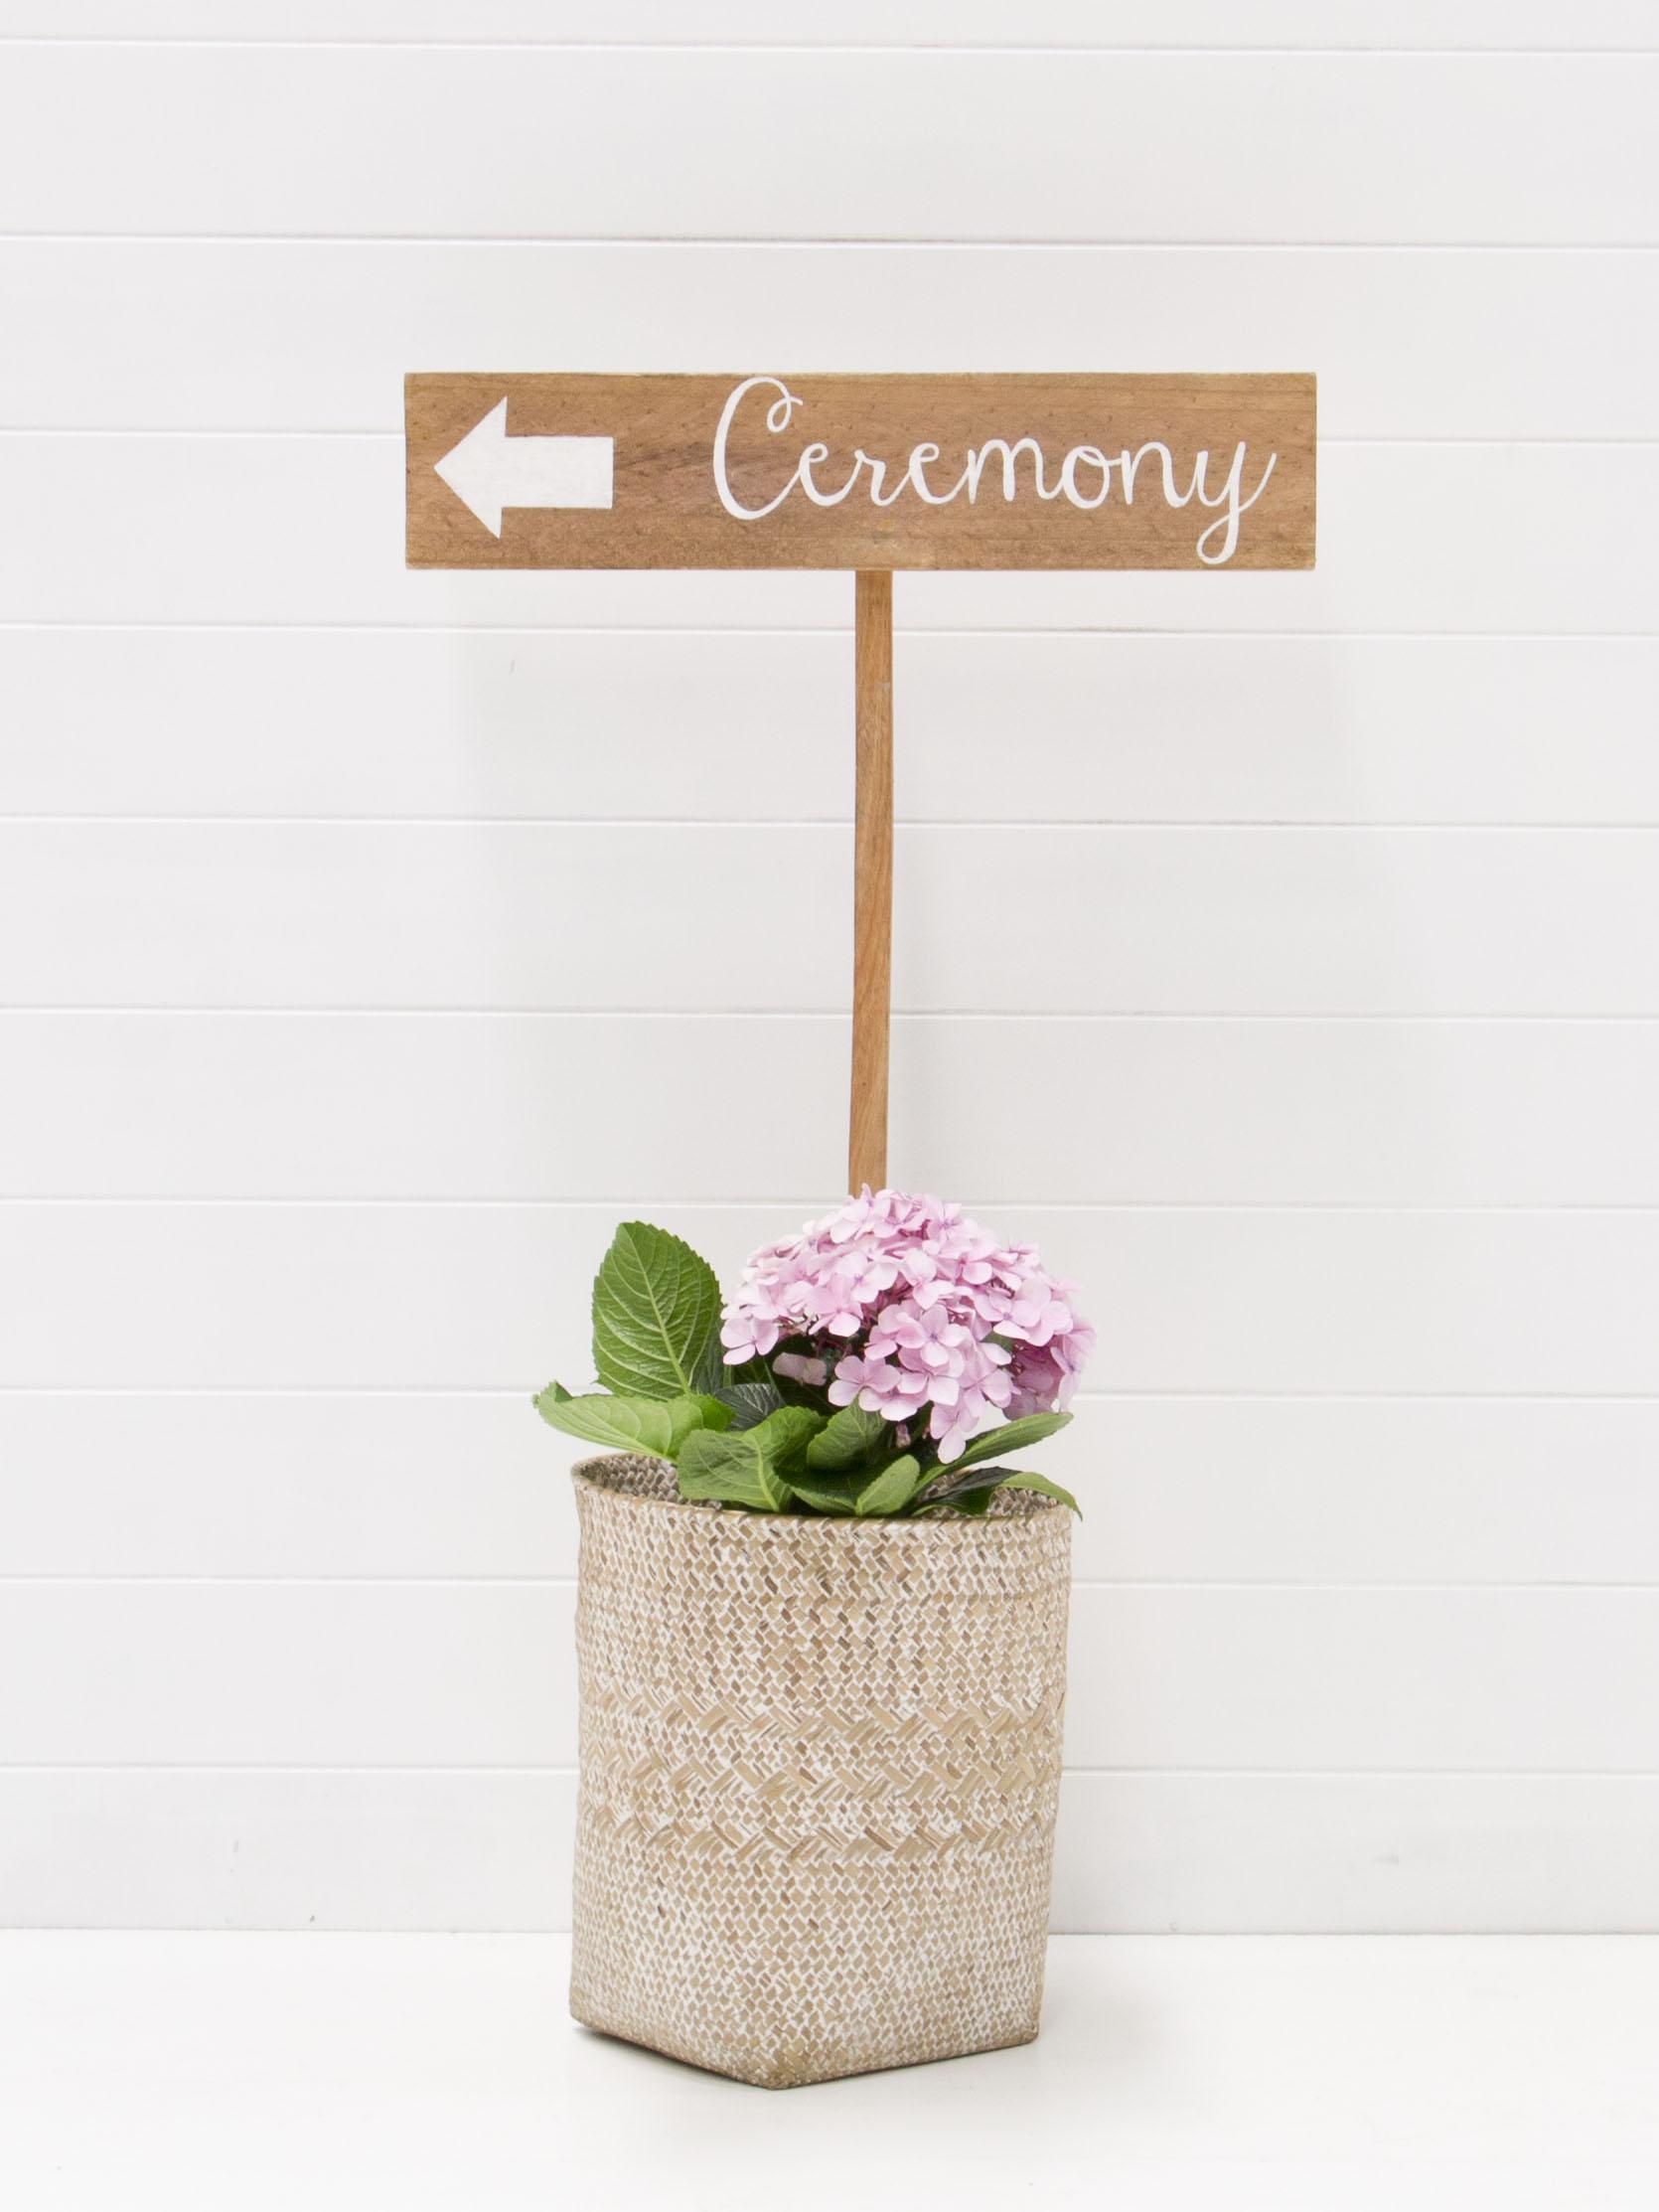 Ceremony wooden sign.jpg